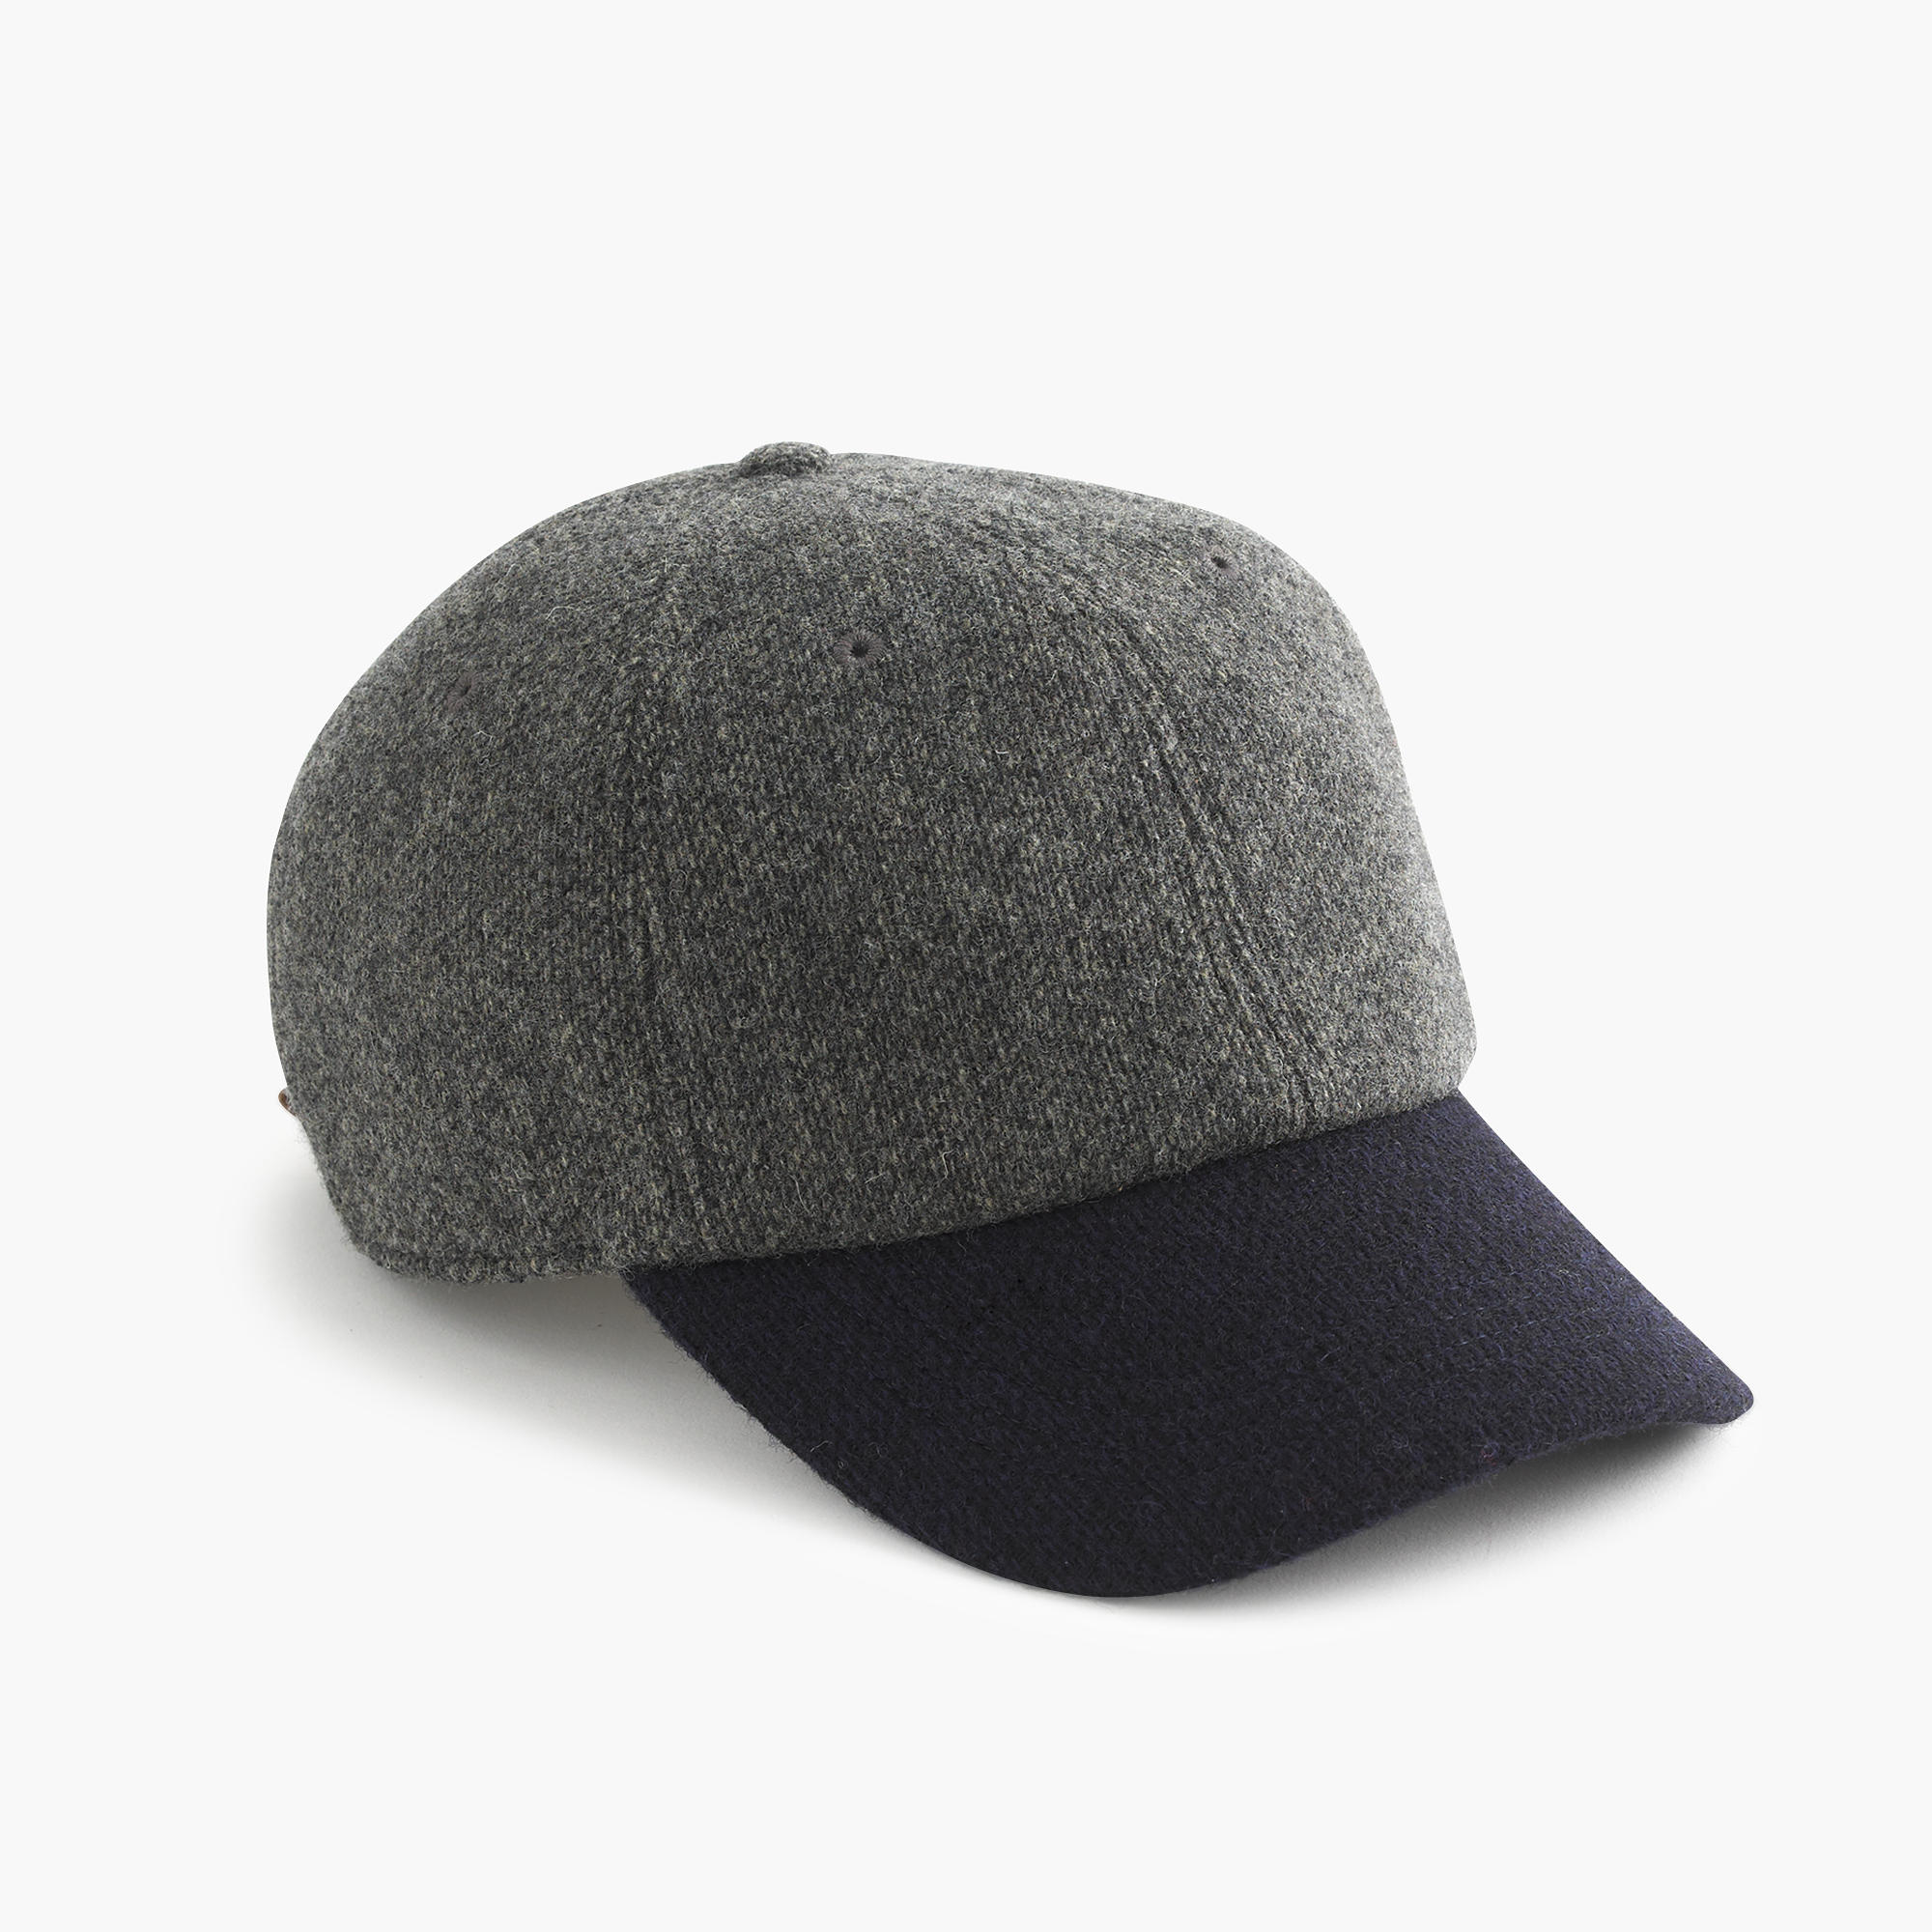 J Crew English Wool Baseball Cap In Gray For Men Lyst